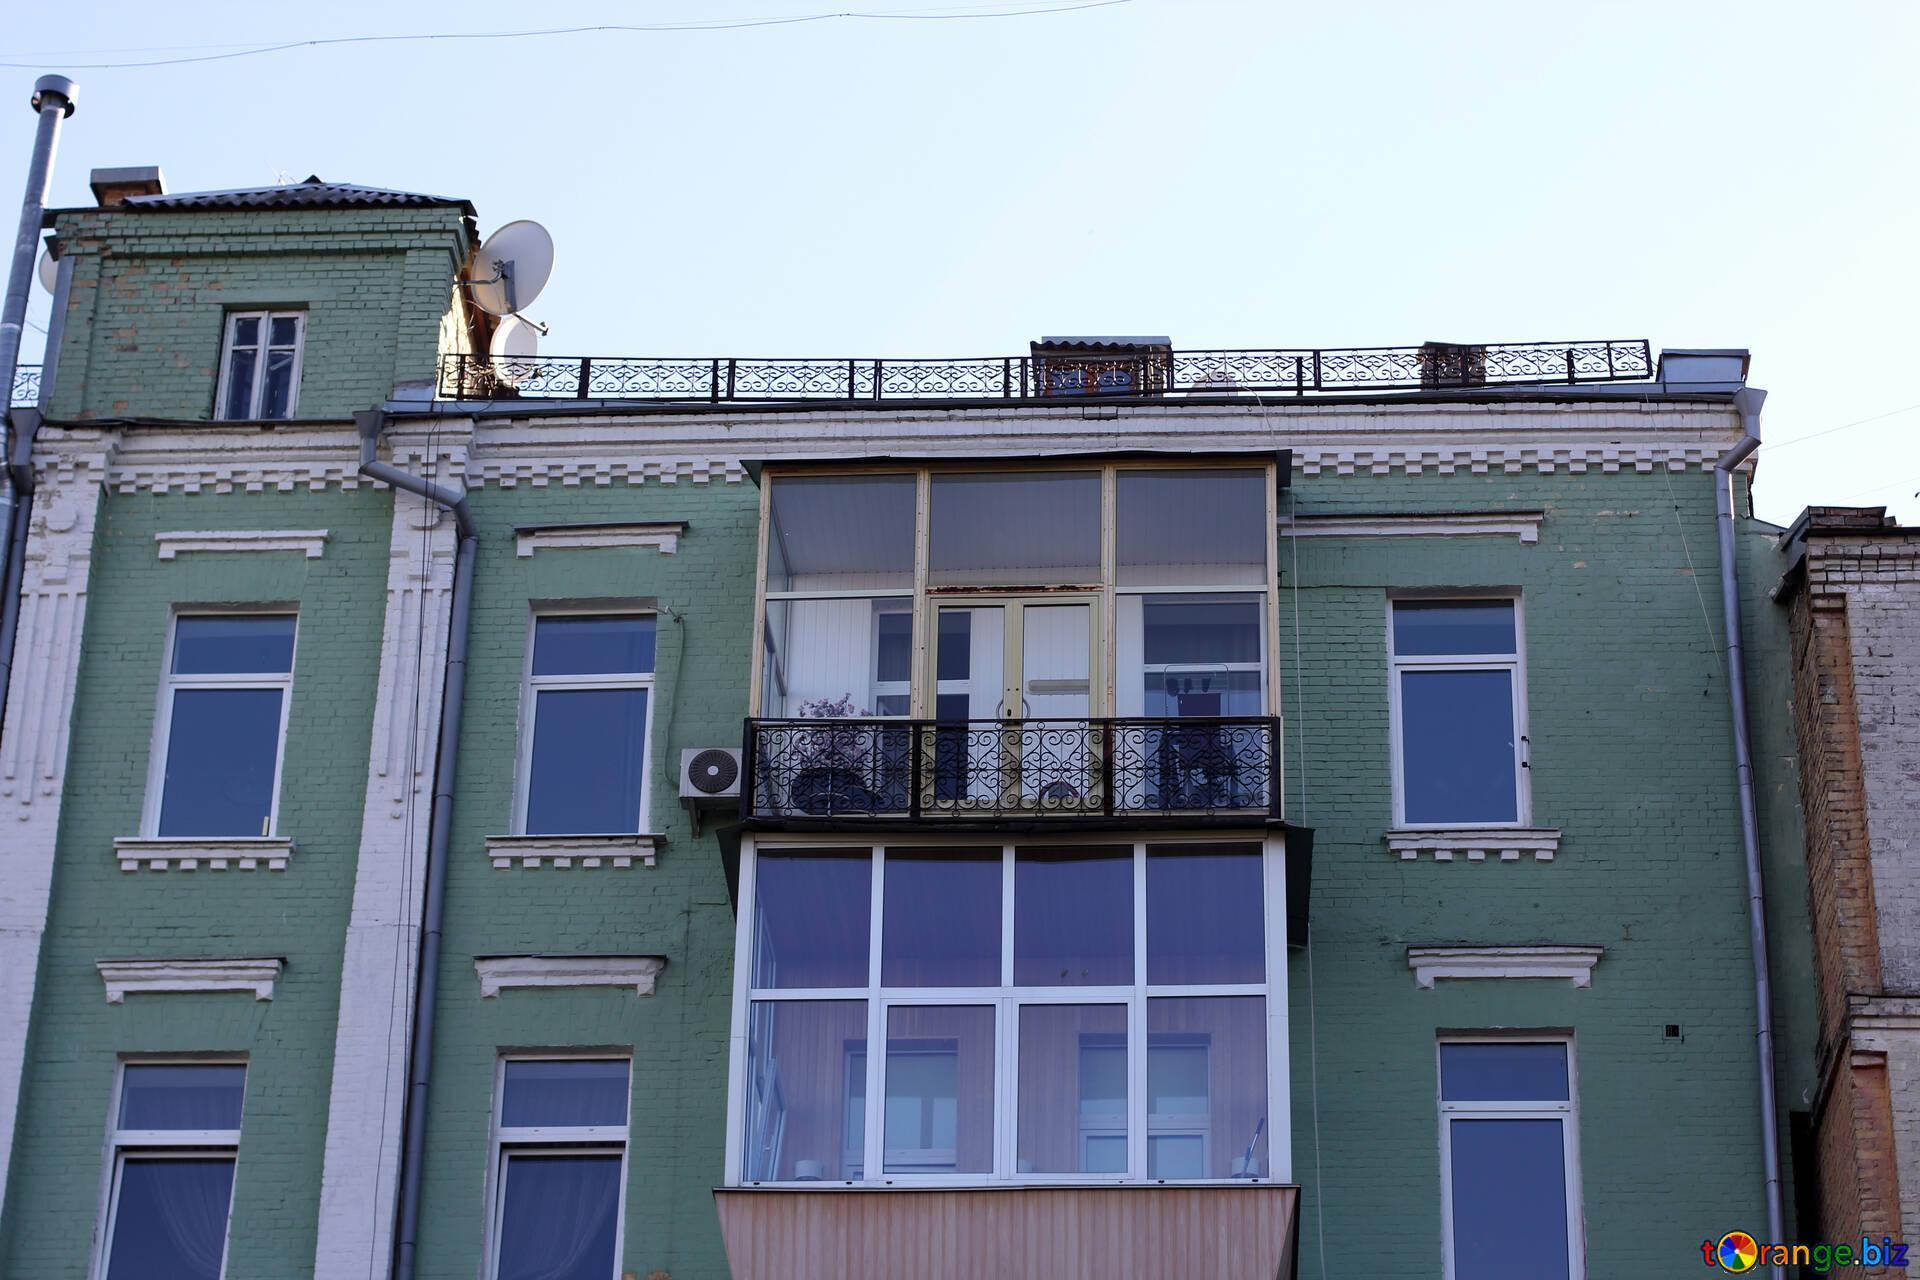 Alte Balkone Verglaste Alten Balkon Gebaude 41739